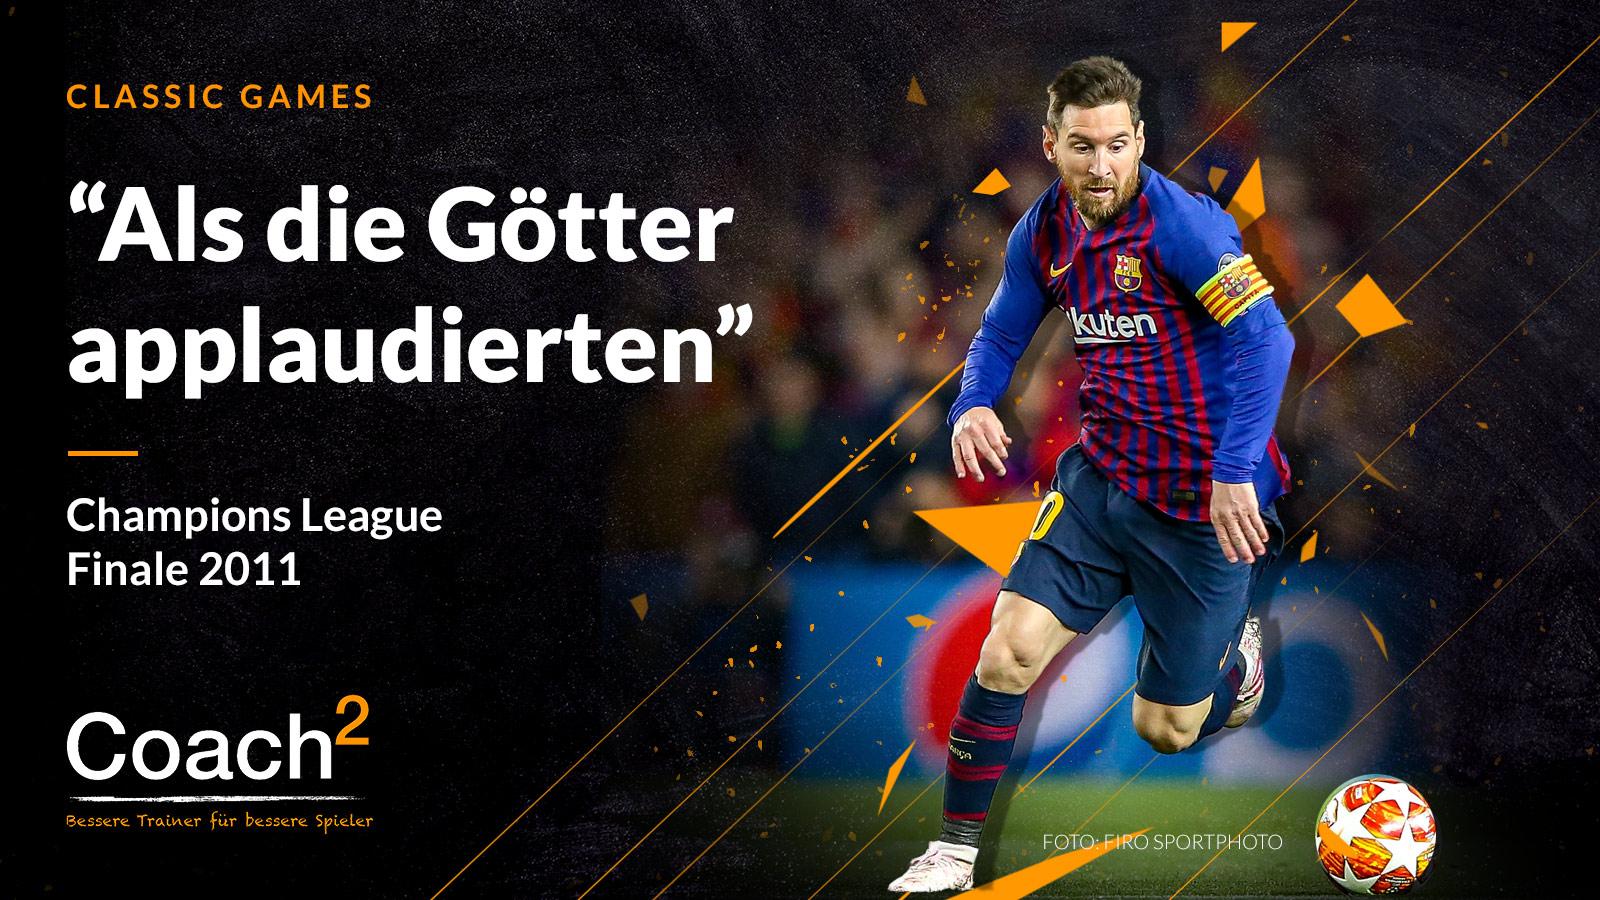 """Als die Götter applaudierten"" – Das Champions League Finale 2011"